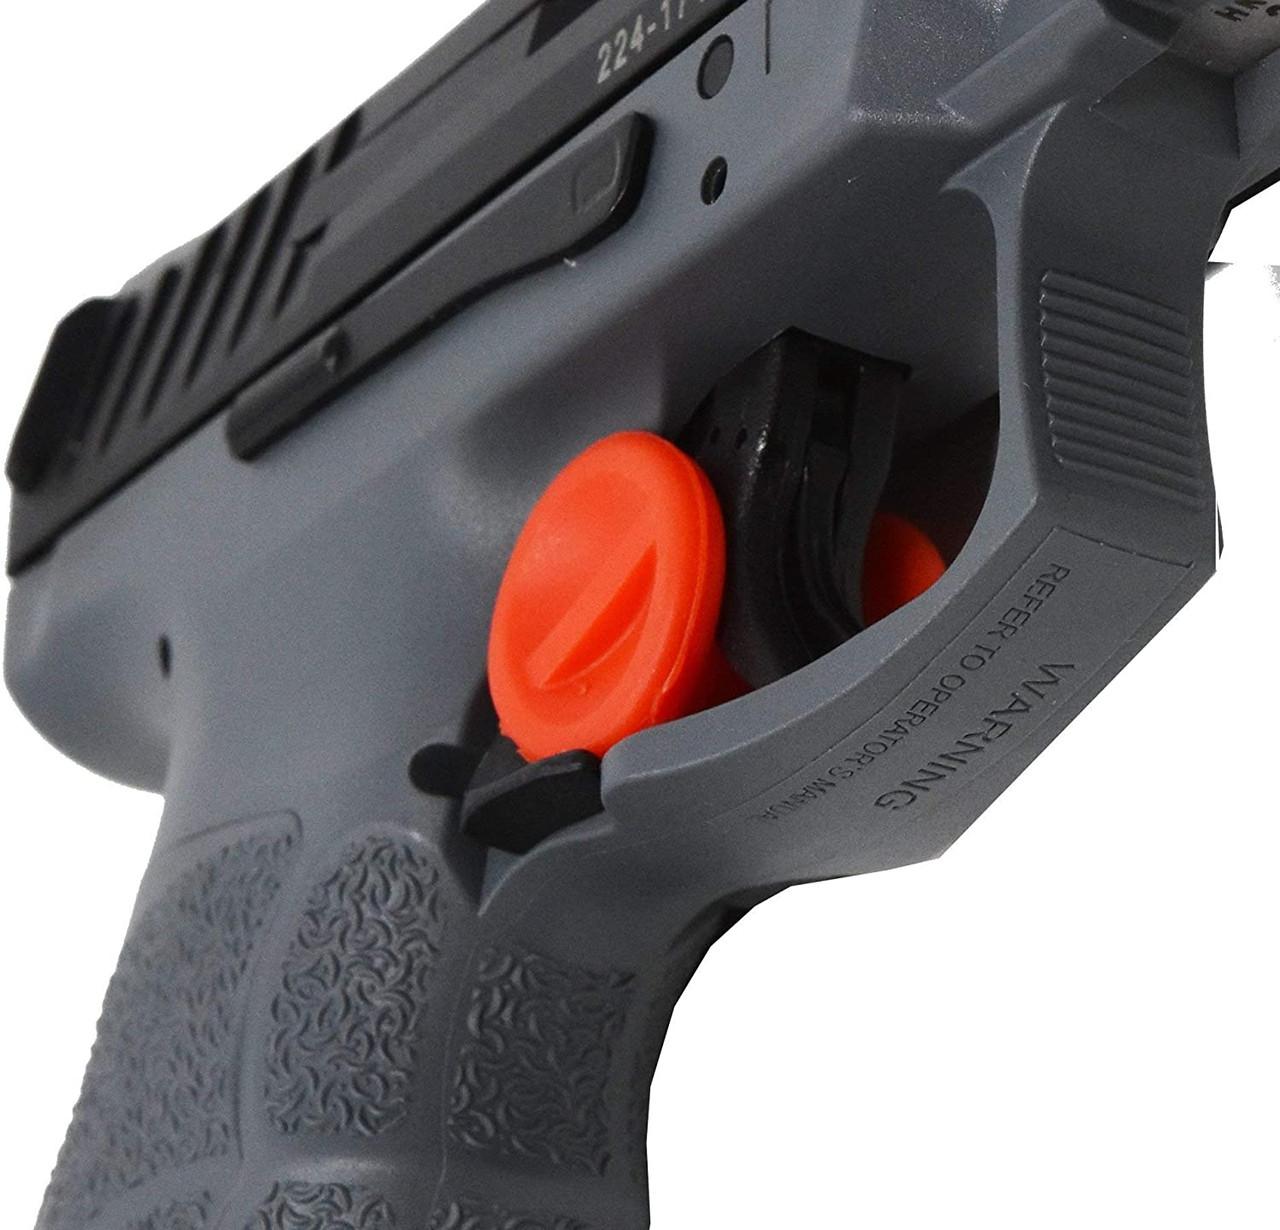 Garrison Grip Micro Trigger Stop Holster for HKVP9